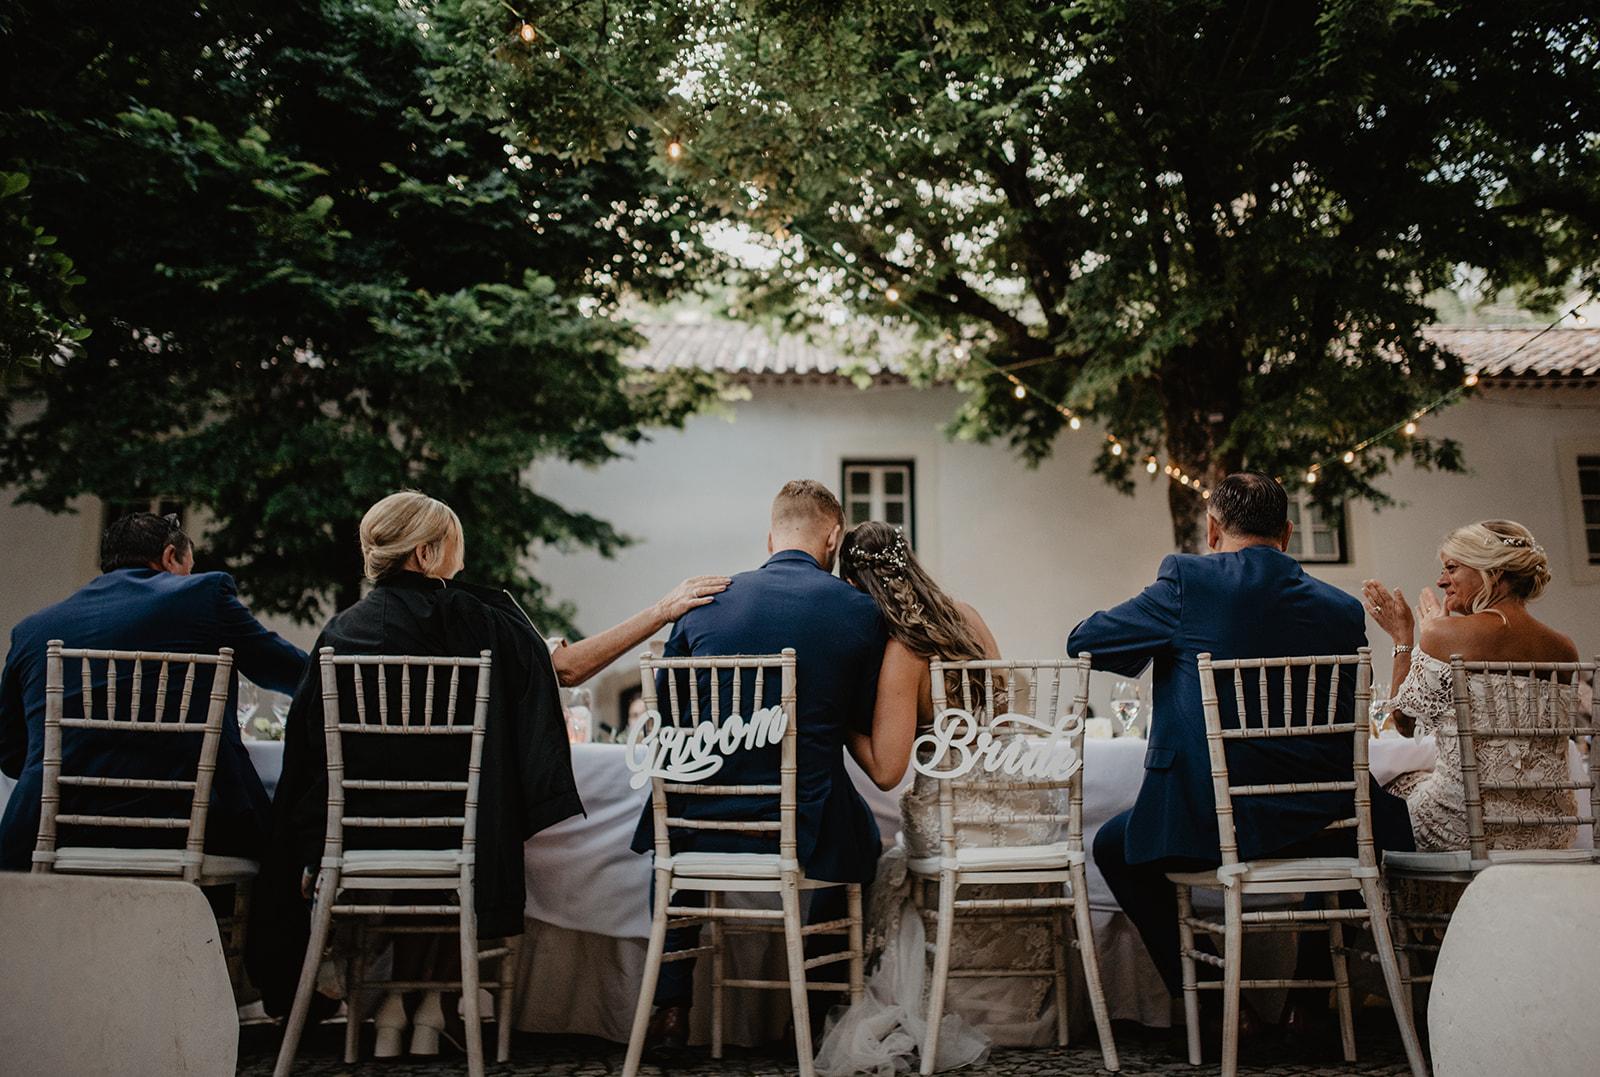 Lapela-photography-wedding-algarve-portugal-best-of-10.jpg